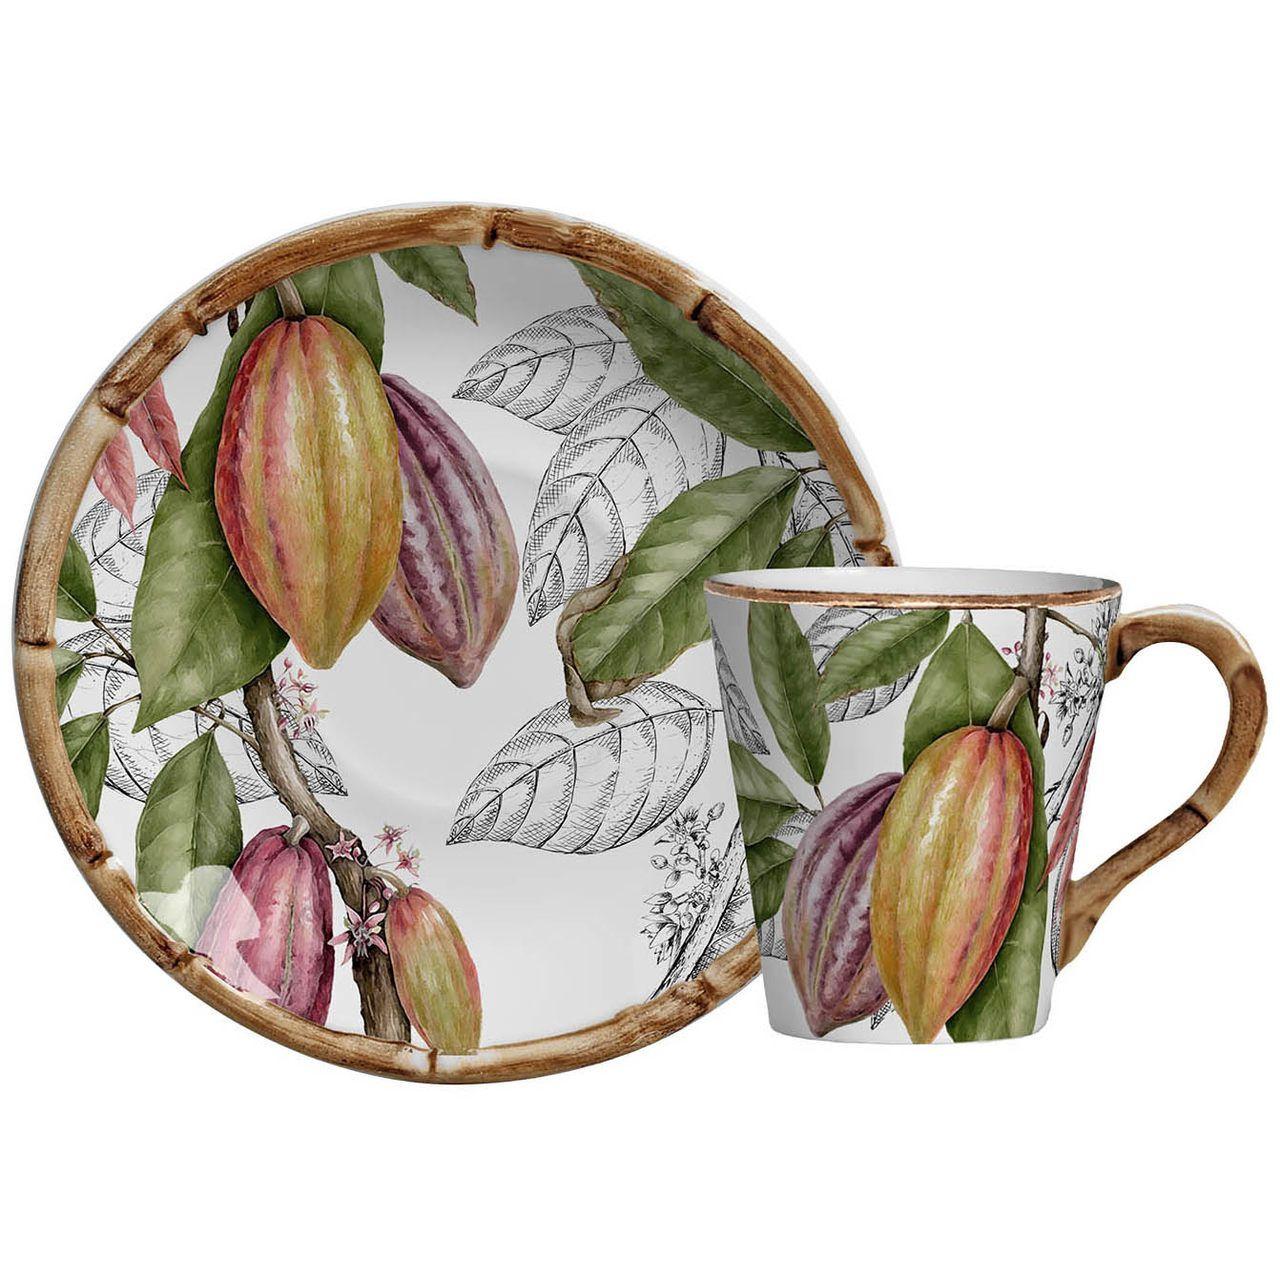 Xícara de Chá C/ Pires Nostri Frutti Cacau (06 Unidades) Cód.: 8170 - MB